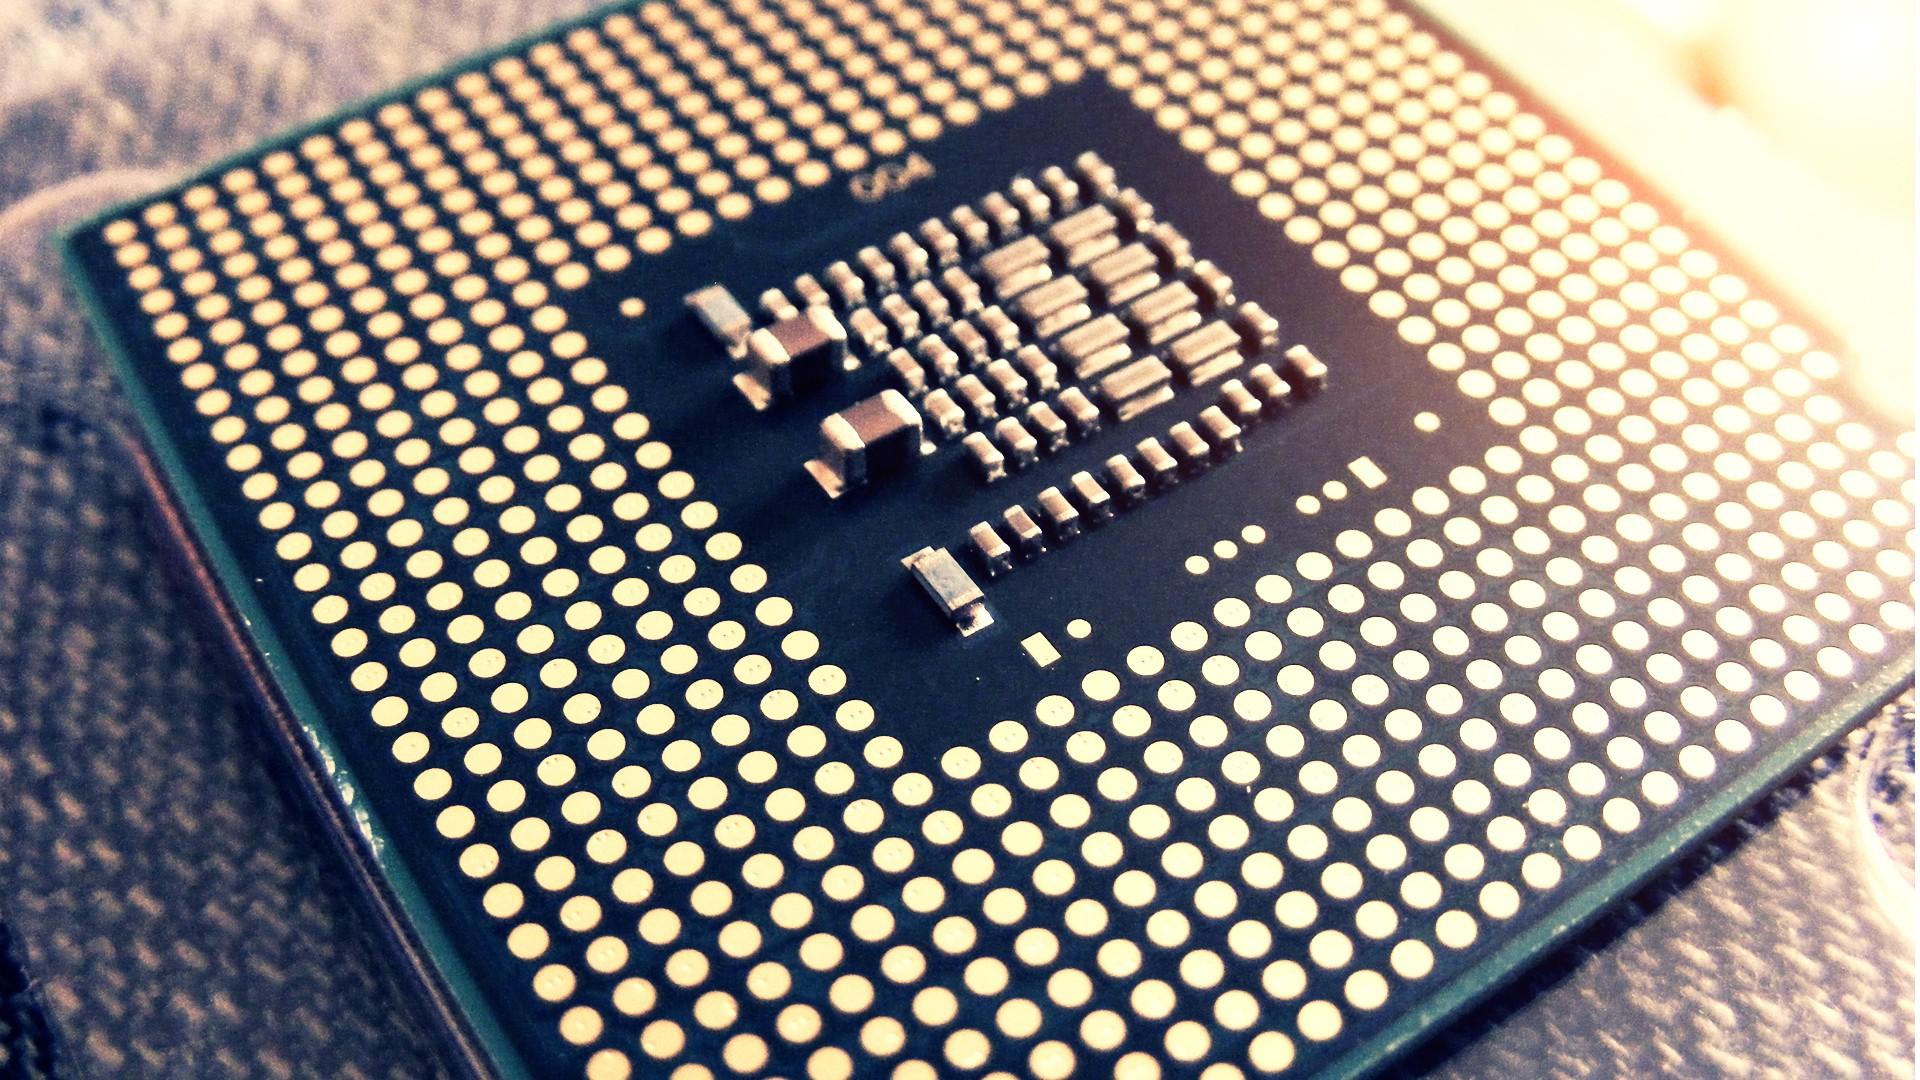 یەکەی چارەسەری زانیاریەکان CPU چیە؟